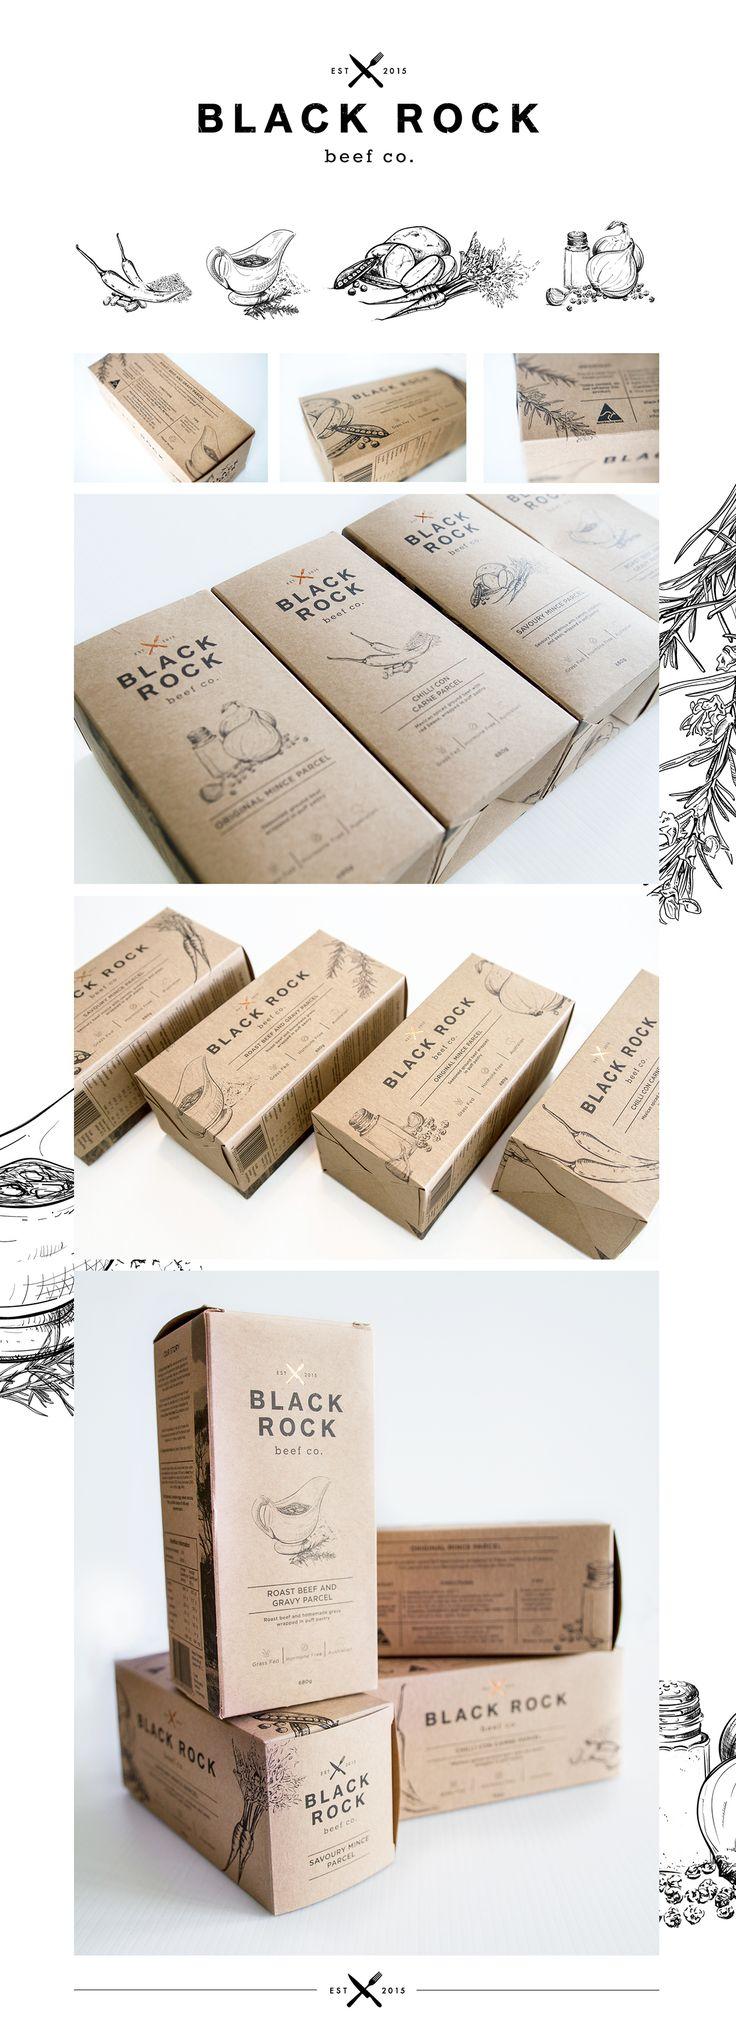 Black Rock Beef co. || Packaging Design on Behance